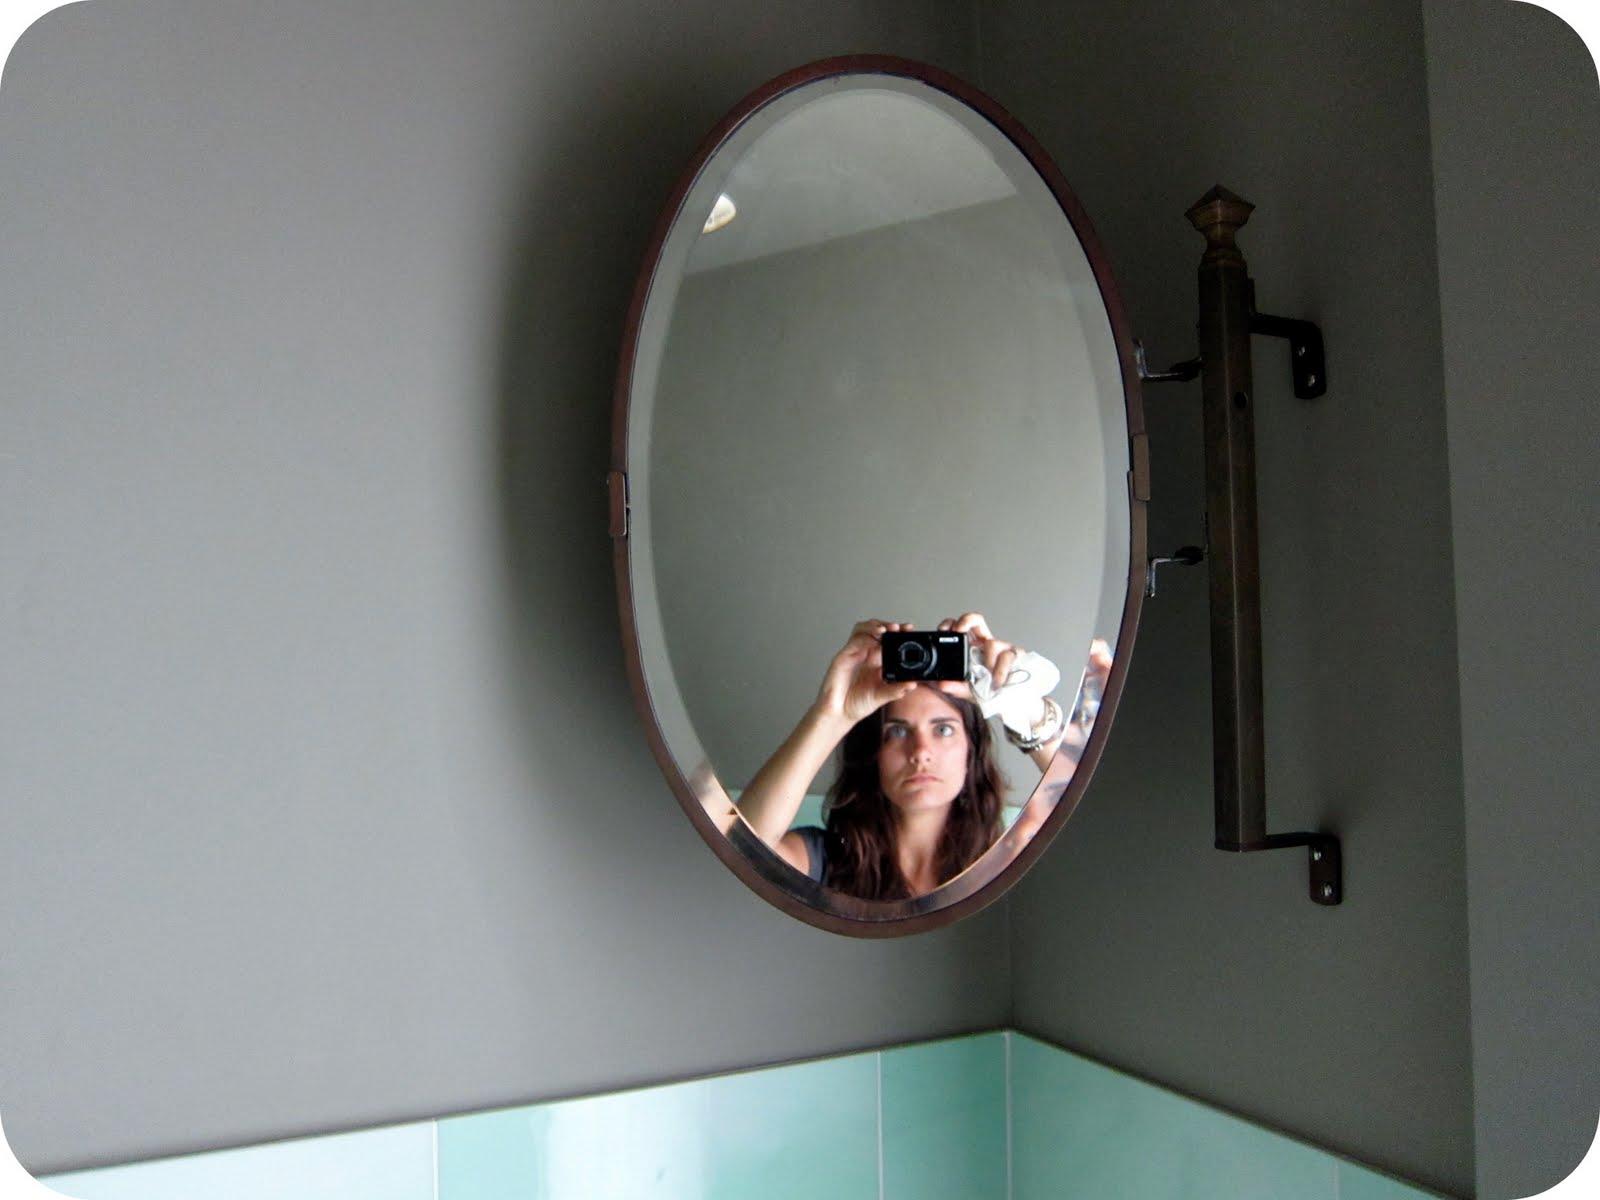 http://4.bp.blogspot.com/_MiIBjnU0ovc/TGzFMaMEYbI/AAAAAAAACJI/82GwDinbjXk/s1600/me+in+martha%27s+mirror.jpg